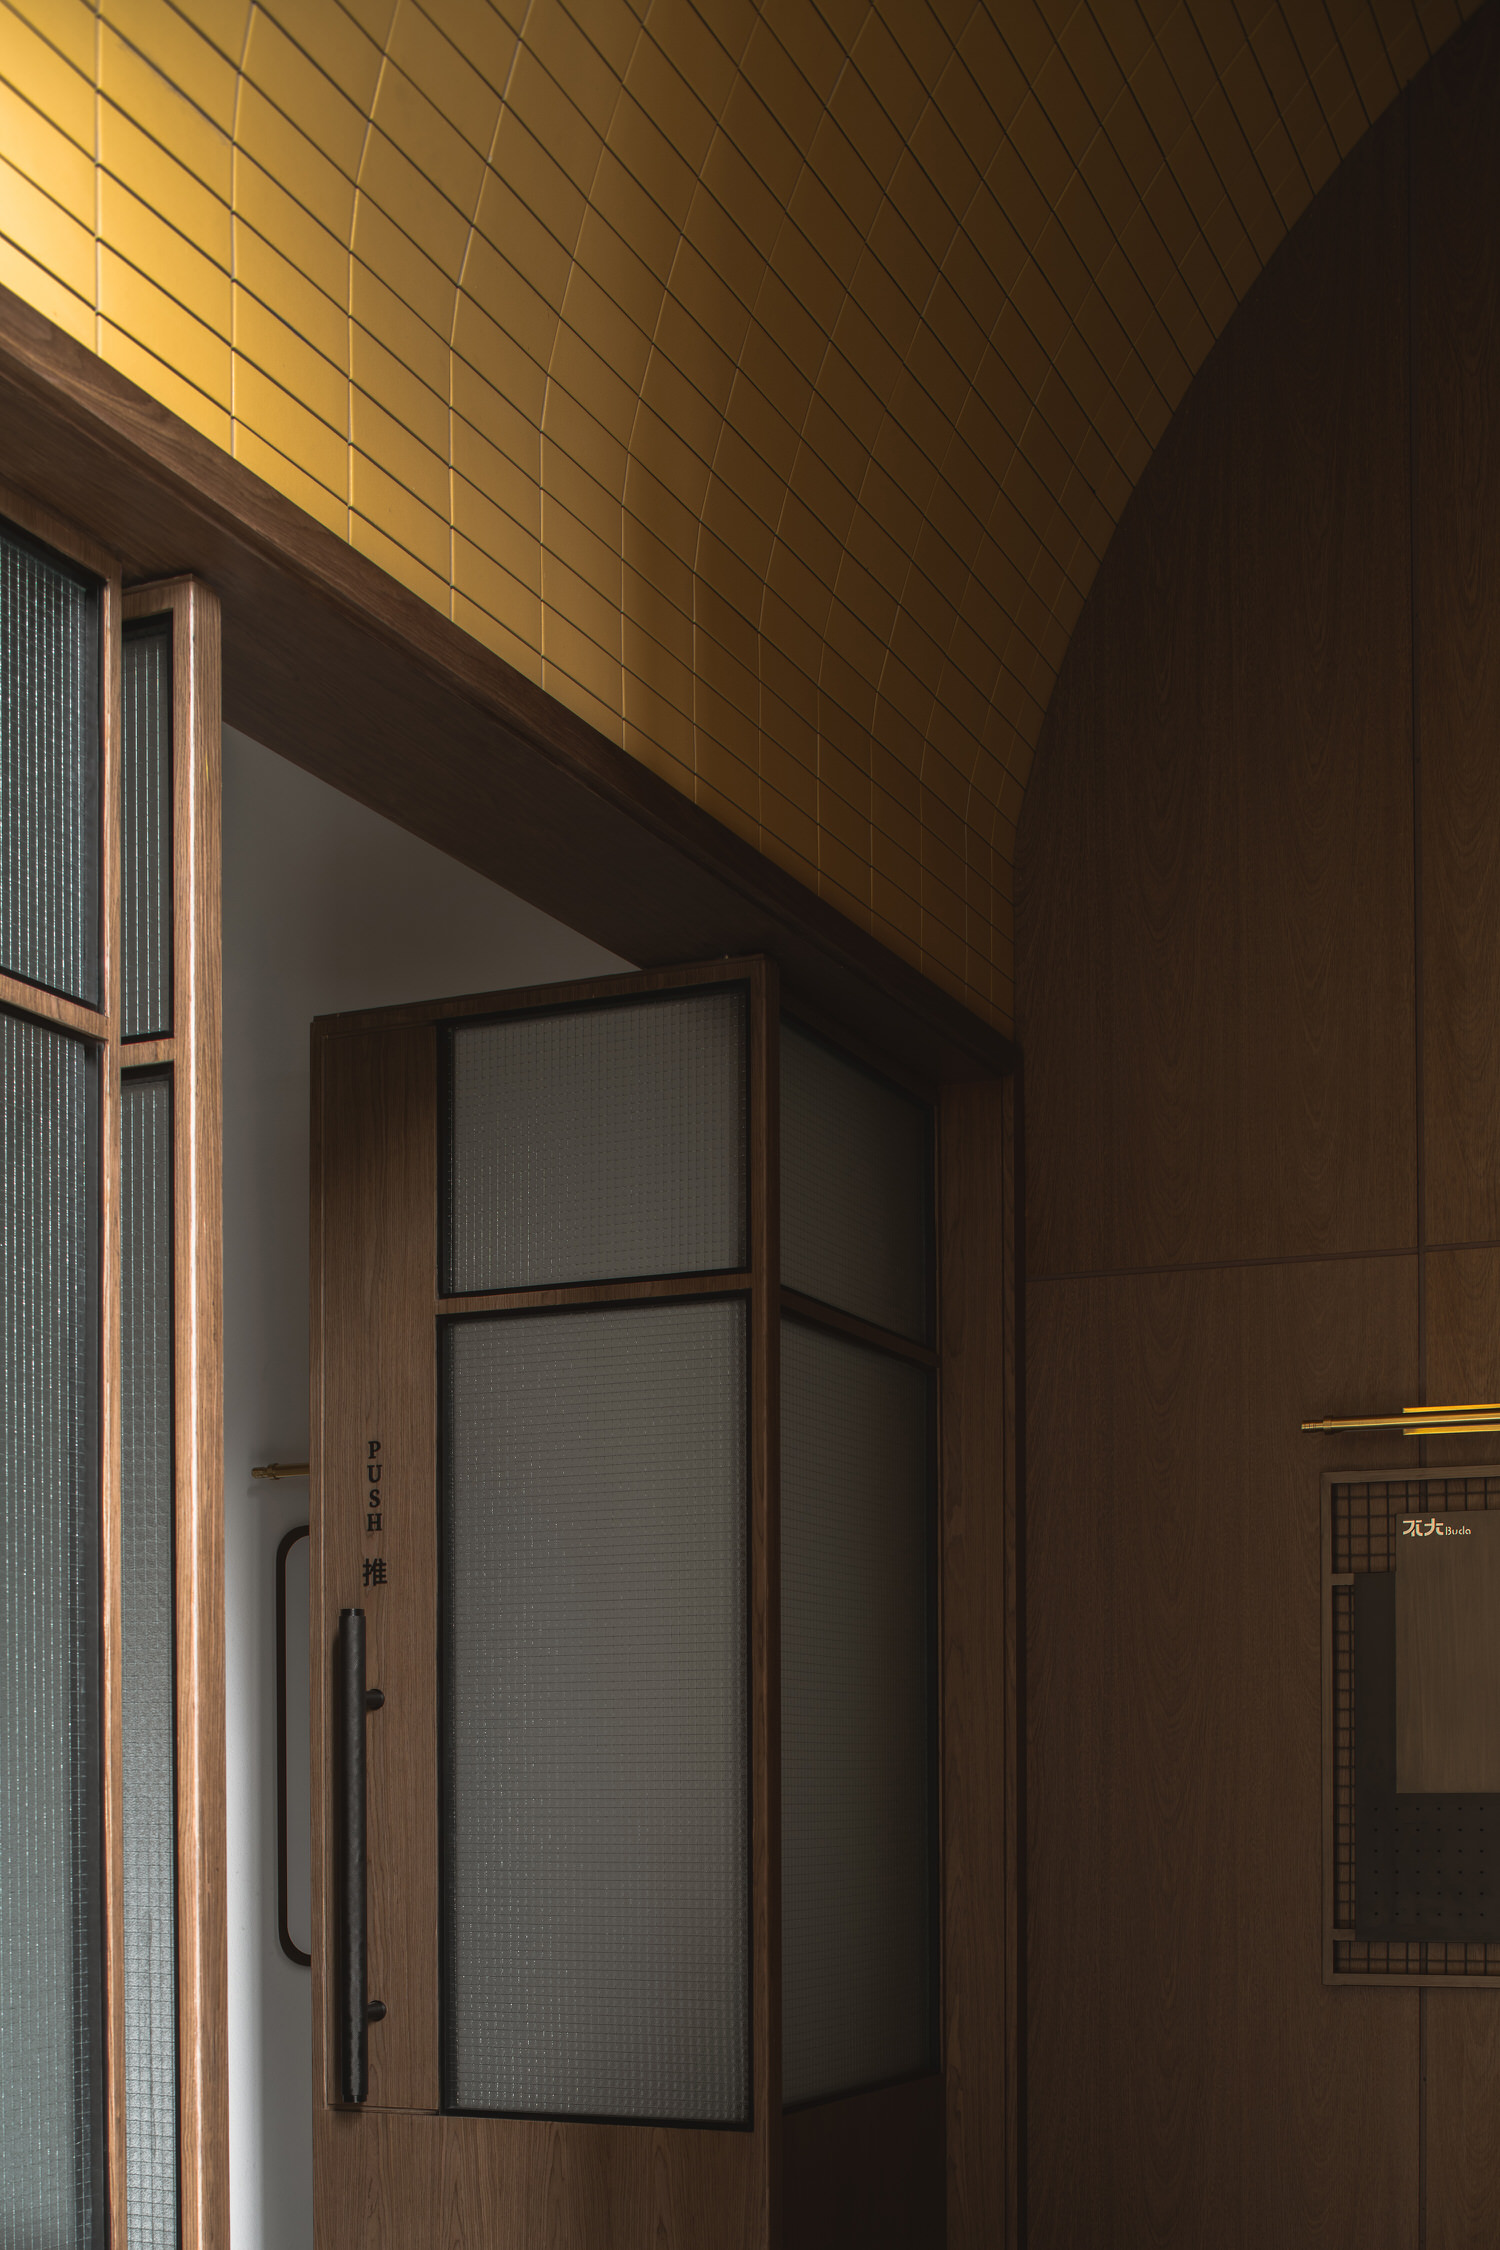 Archetype Design Organization Buda Hotel Chengdu Photo Here Space Yellowtrace 02